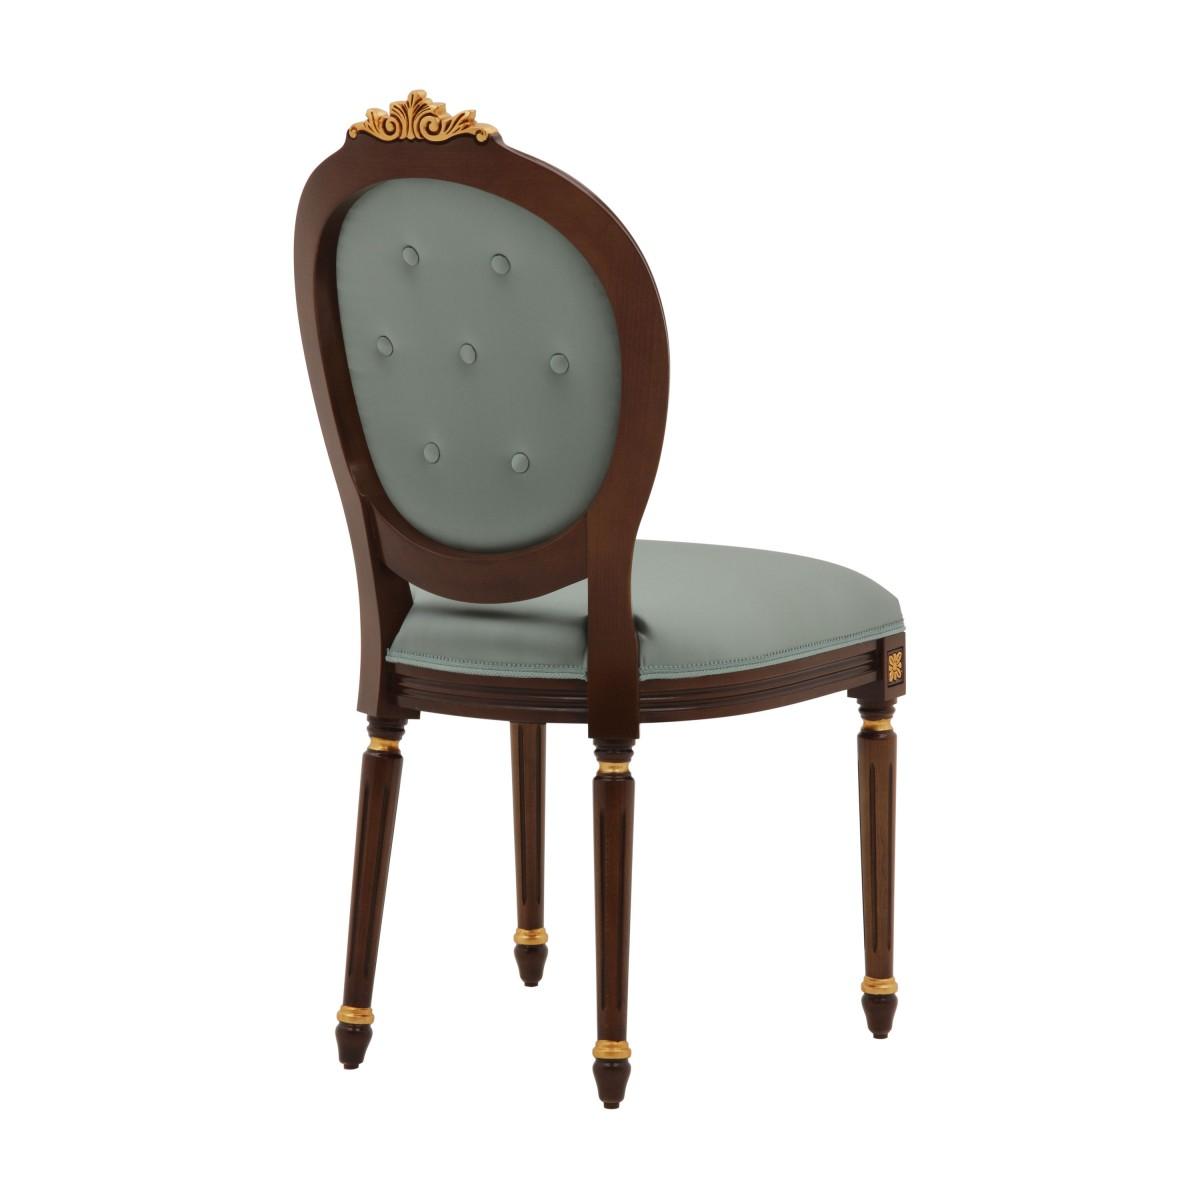 Chair Savoia - Sevensedie